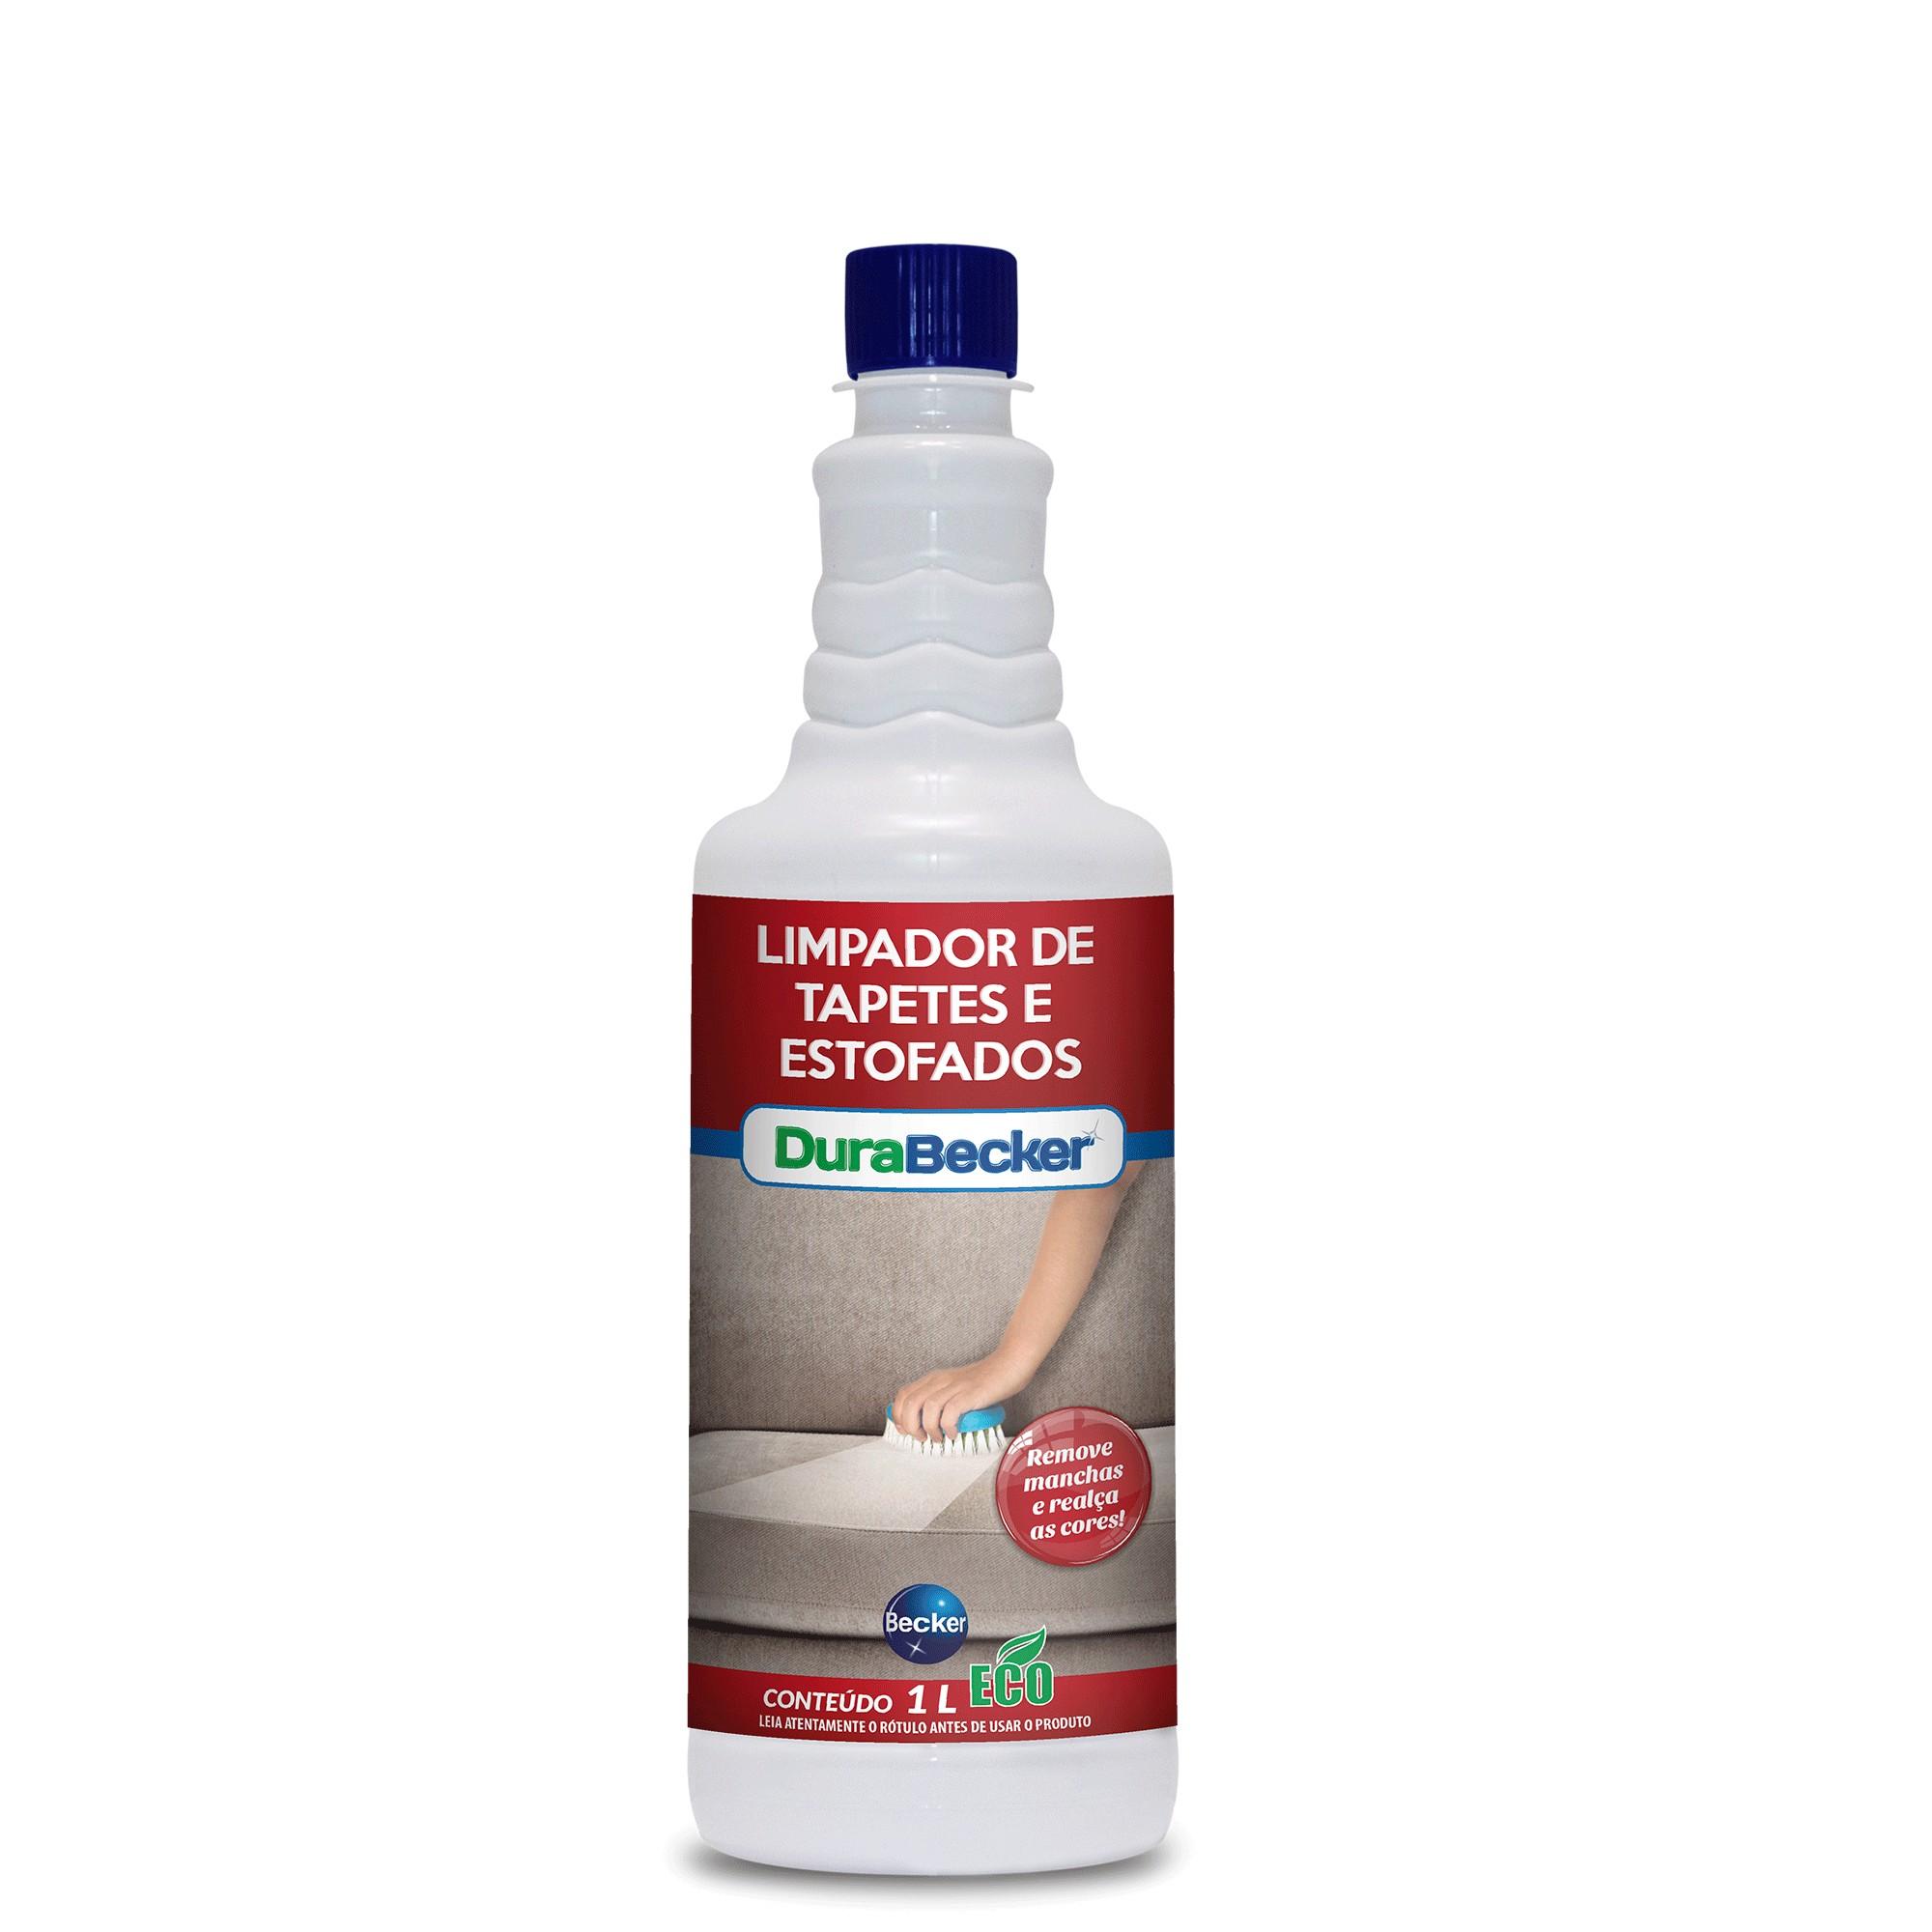 Limpador de Tapetes e Estofados 1L - Becker